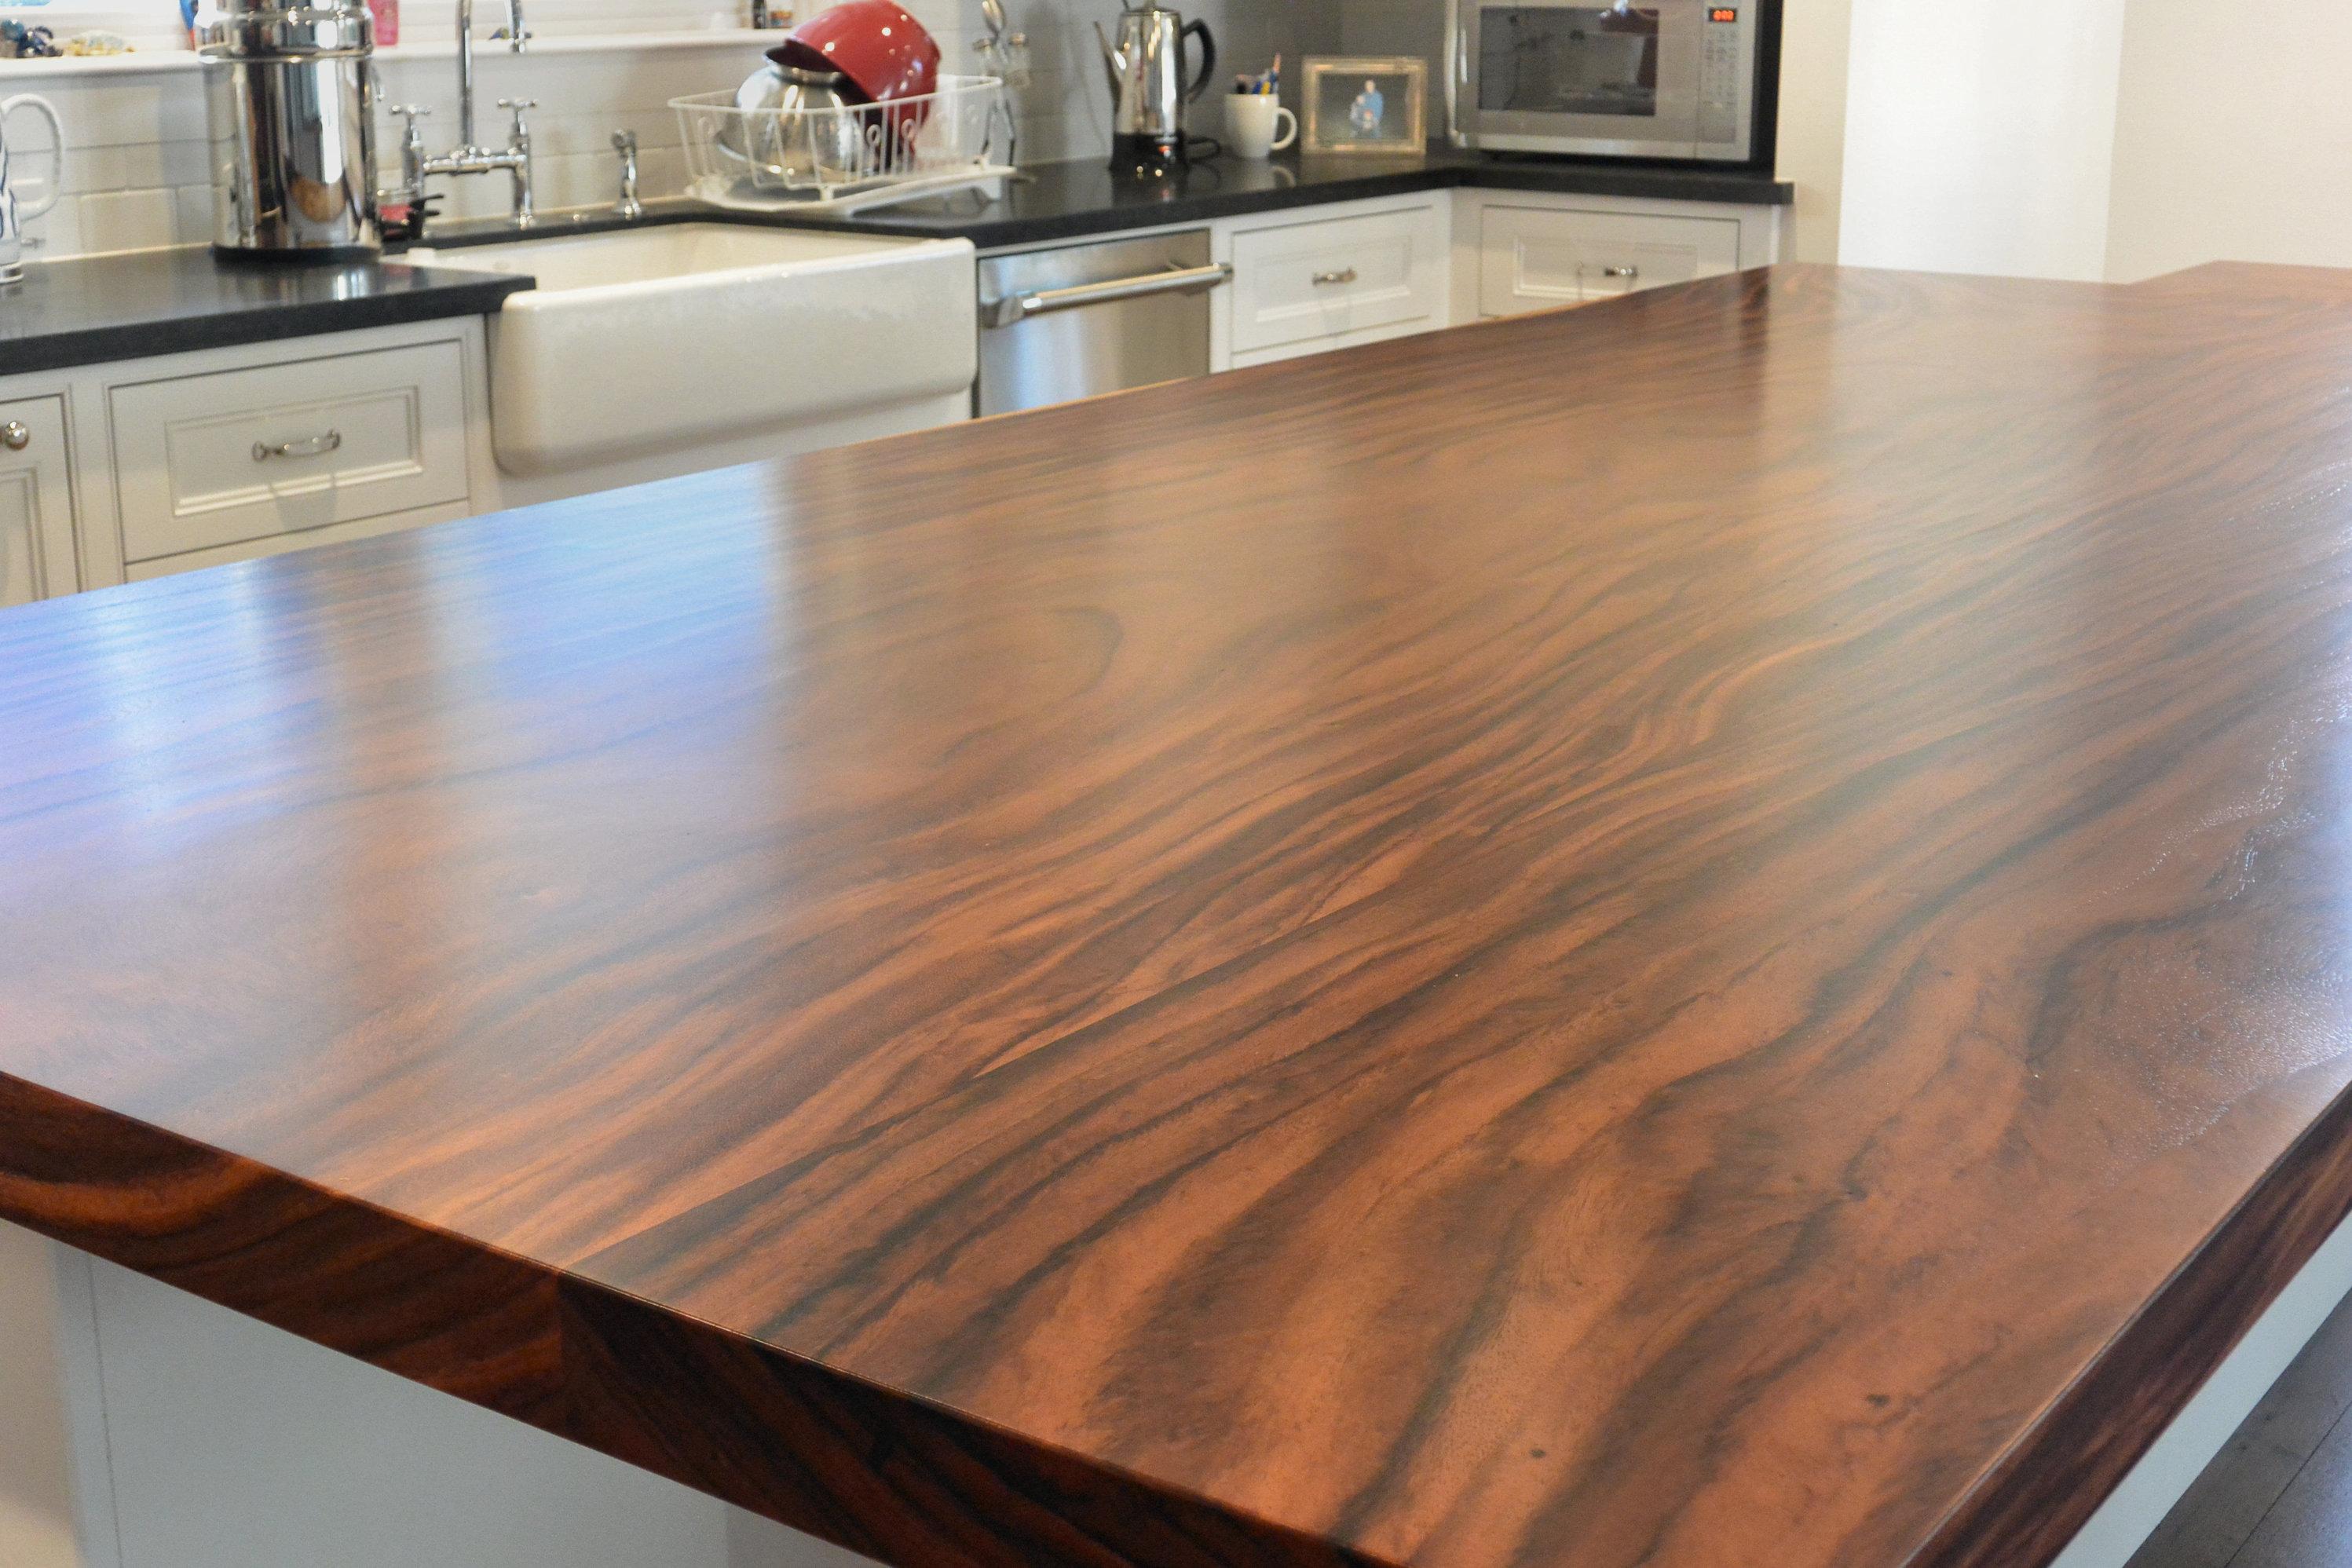 Guanacaste parota live edge wood slab countertop photo for Live edge wood countertops